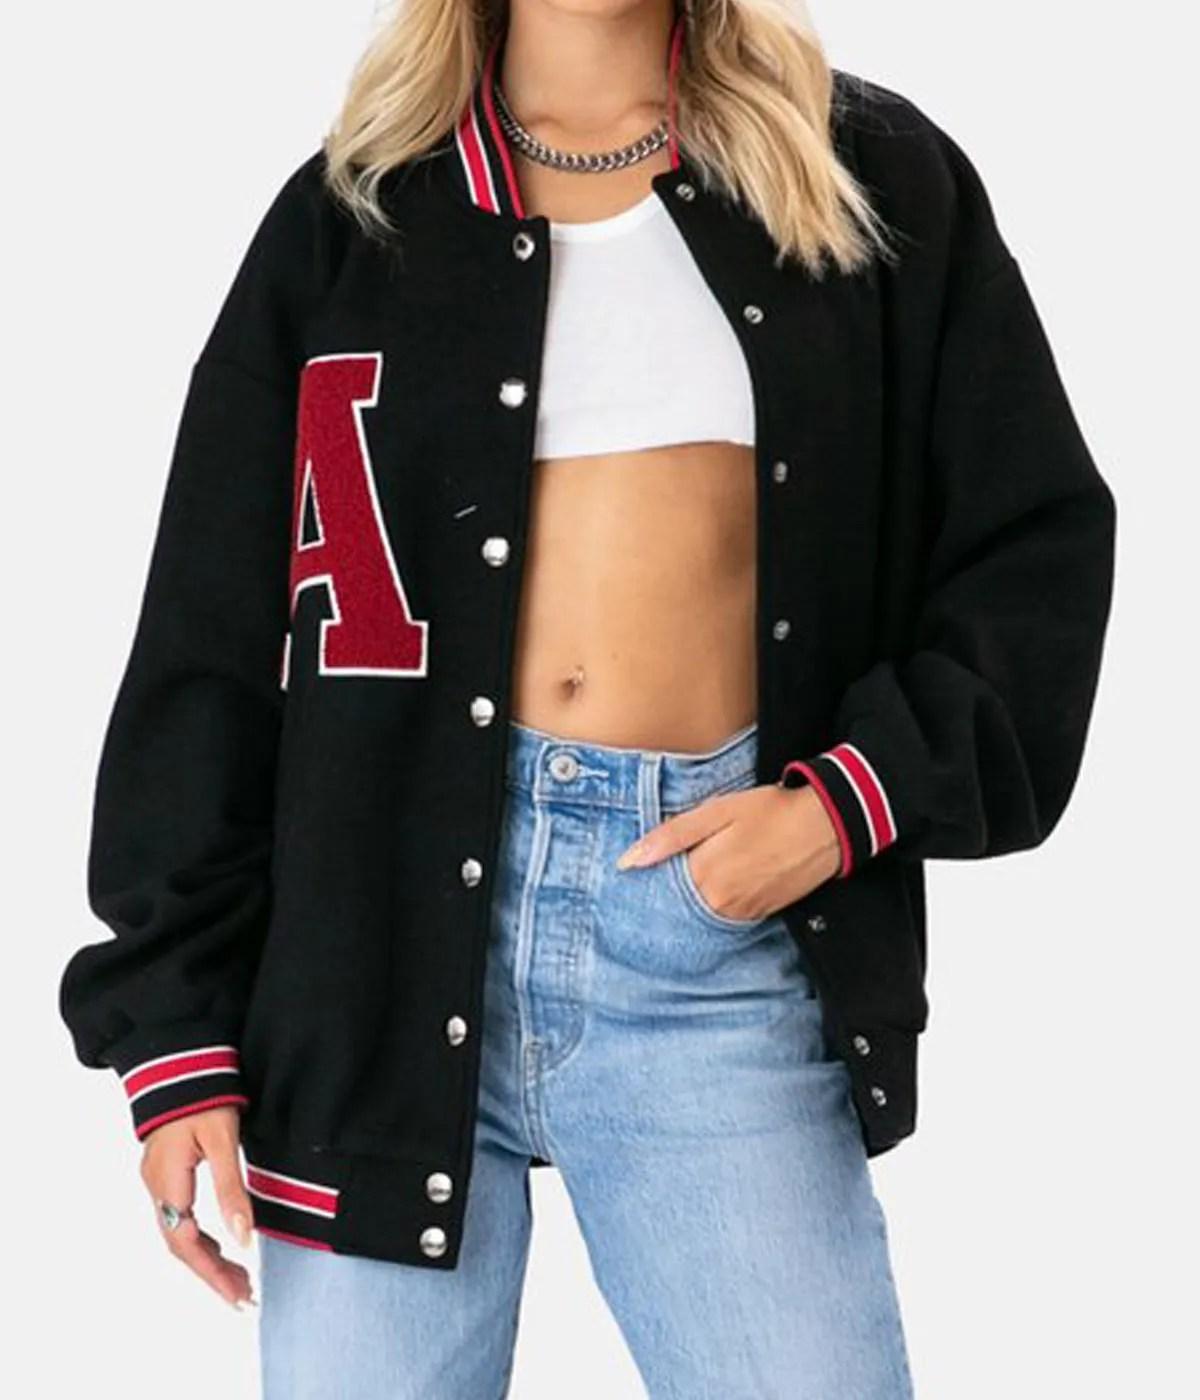 maddox-adika-jacket